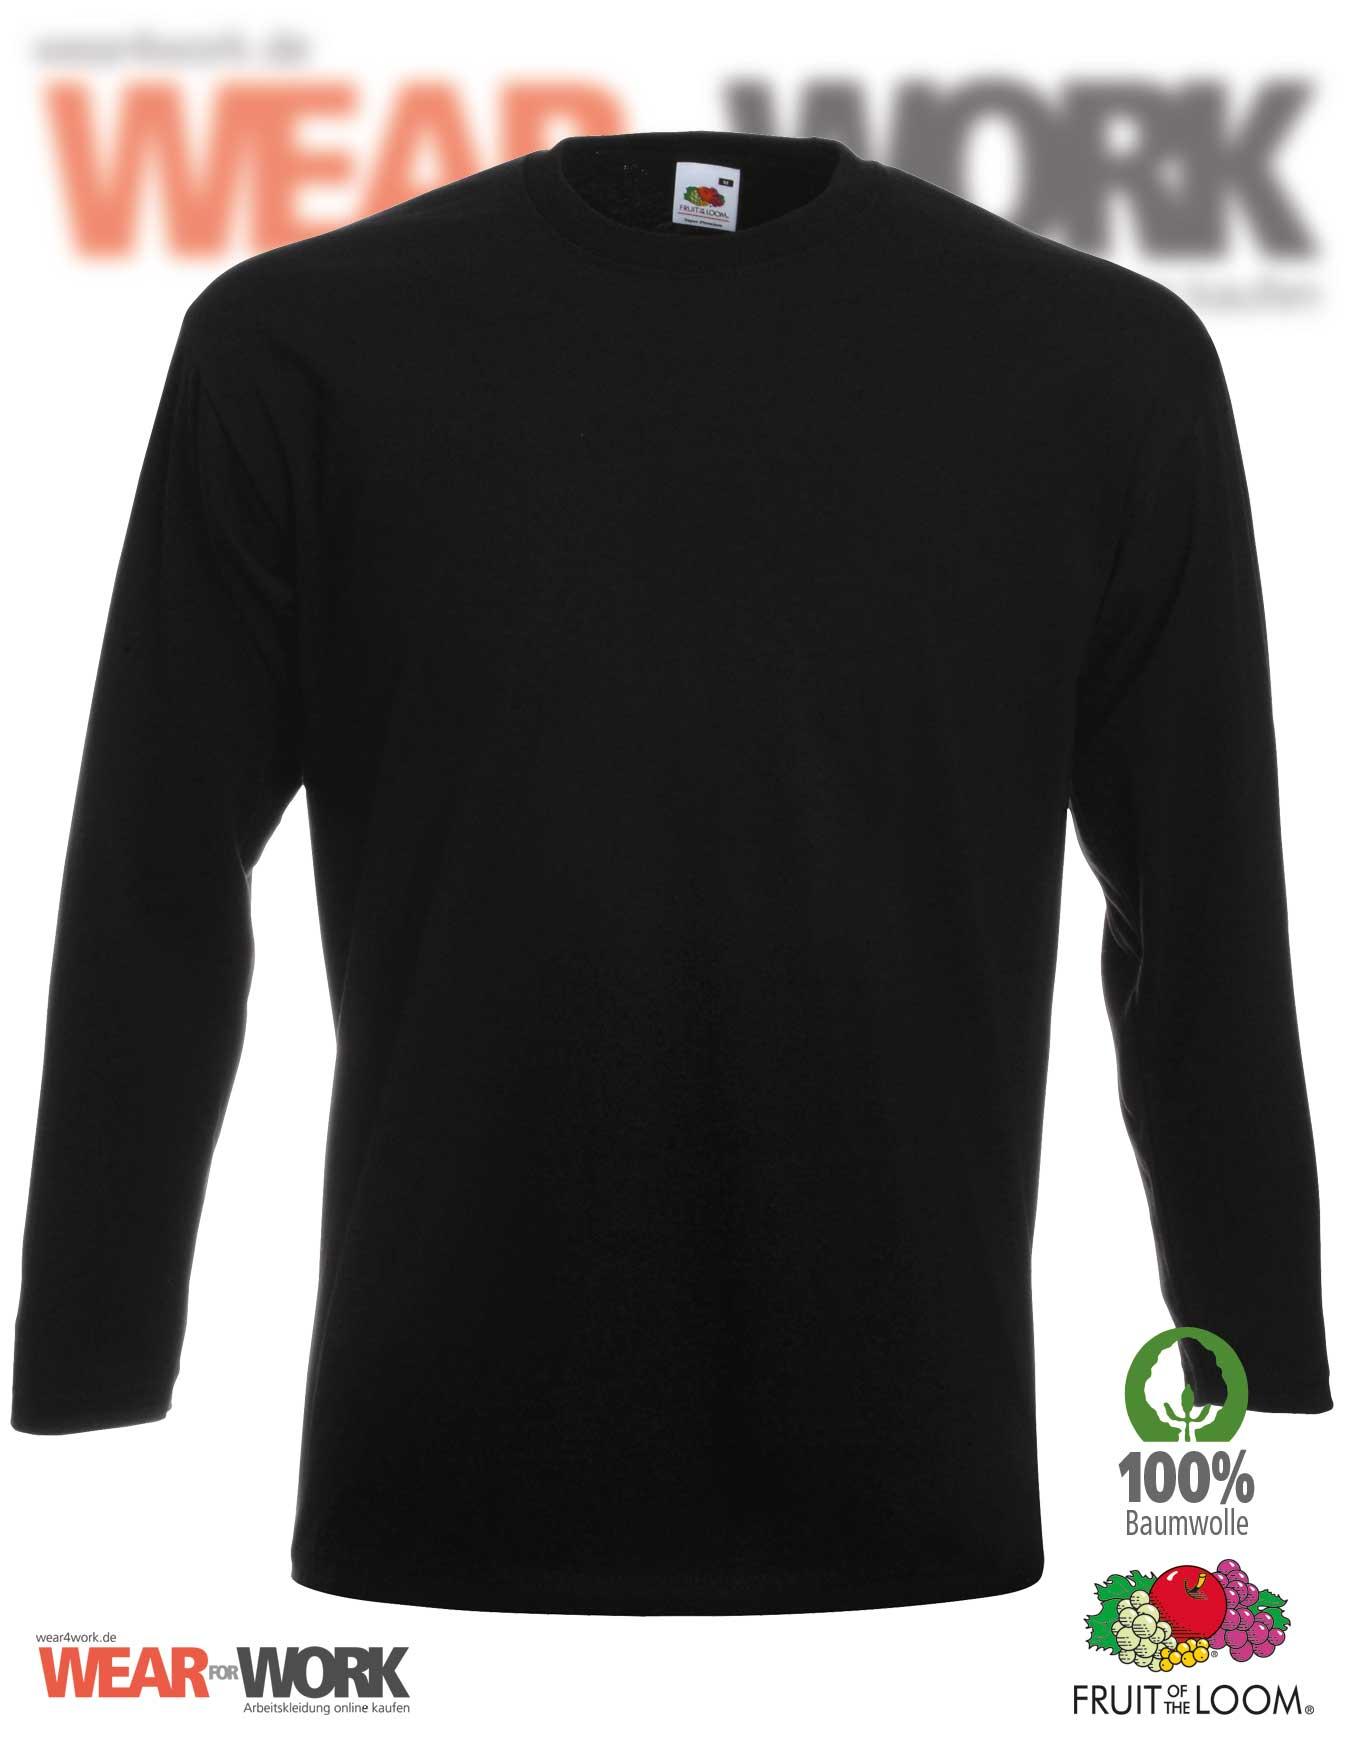 02f7c6758f57 Workwear T-Shirt langarm schwarz 61-042-0   Fruit of the Loom